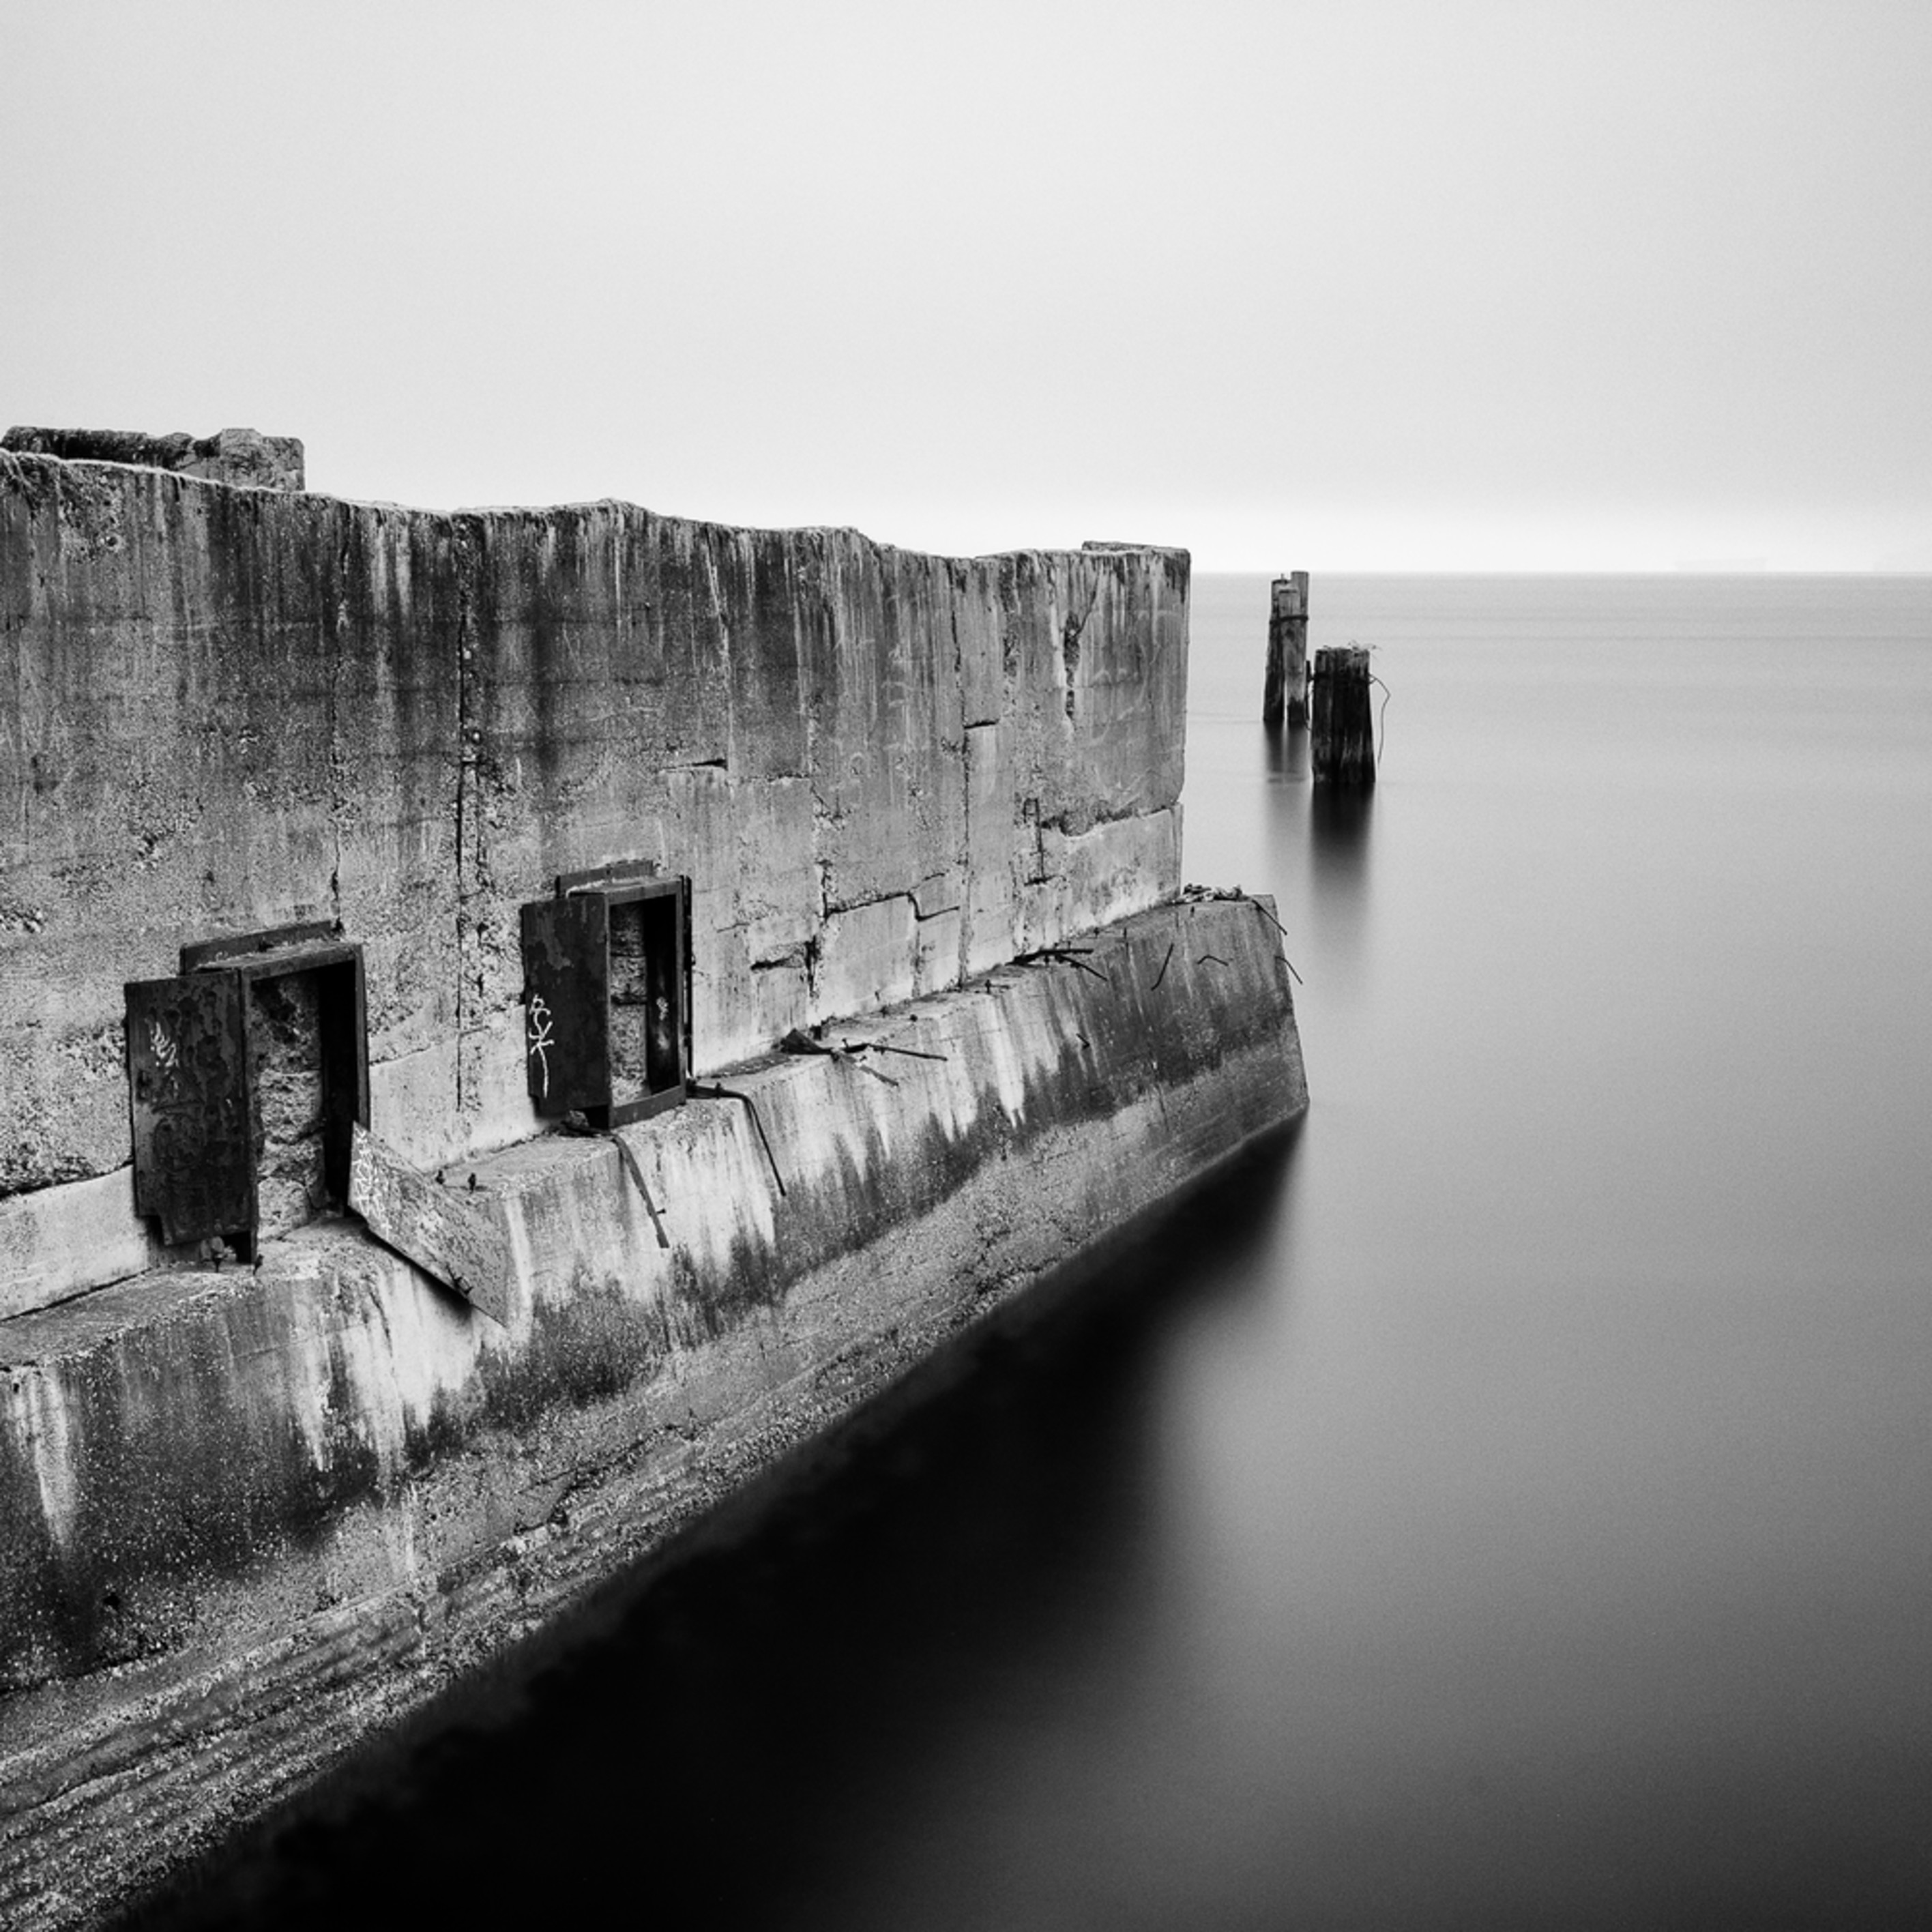 Concrete ruins on the puget sound tacoma washington january 2014 bwoktk